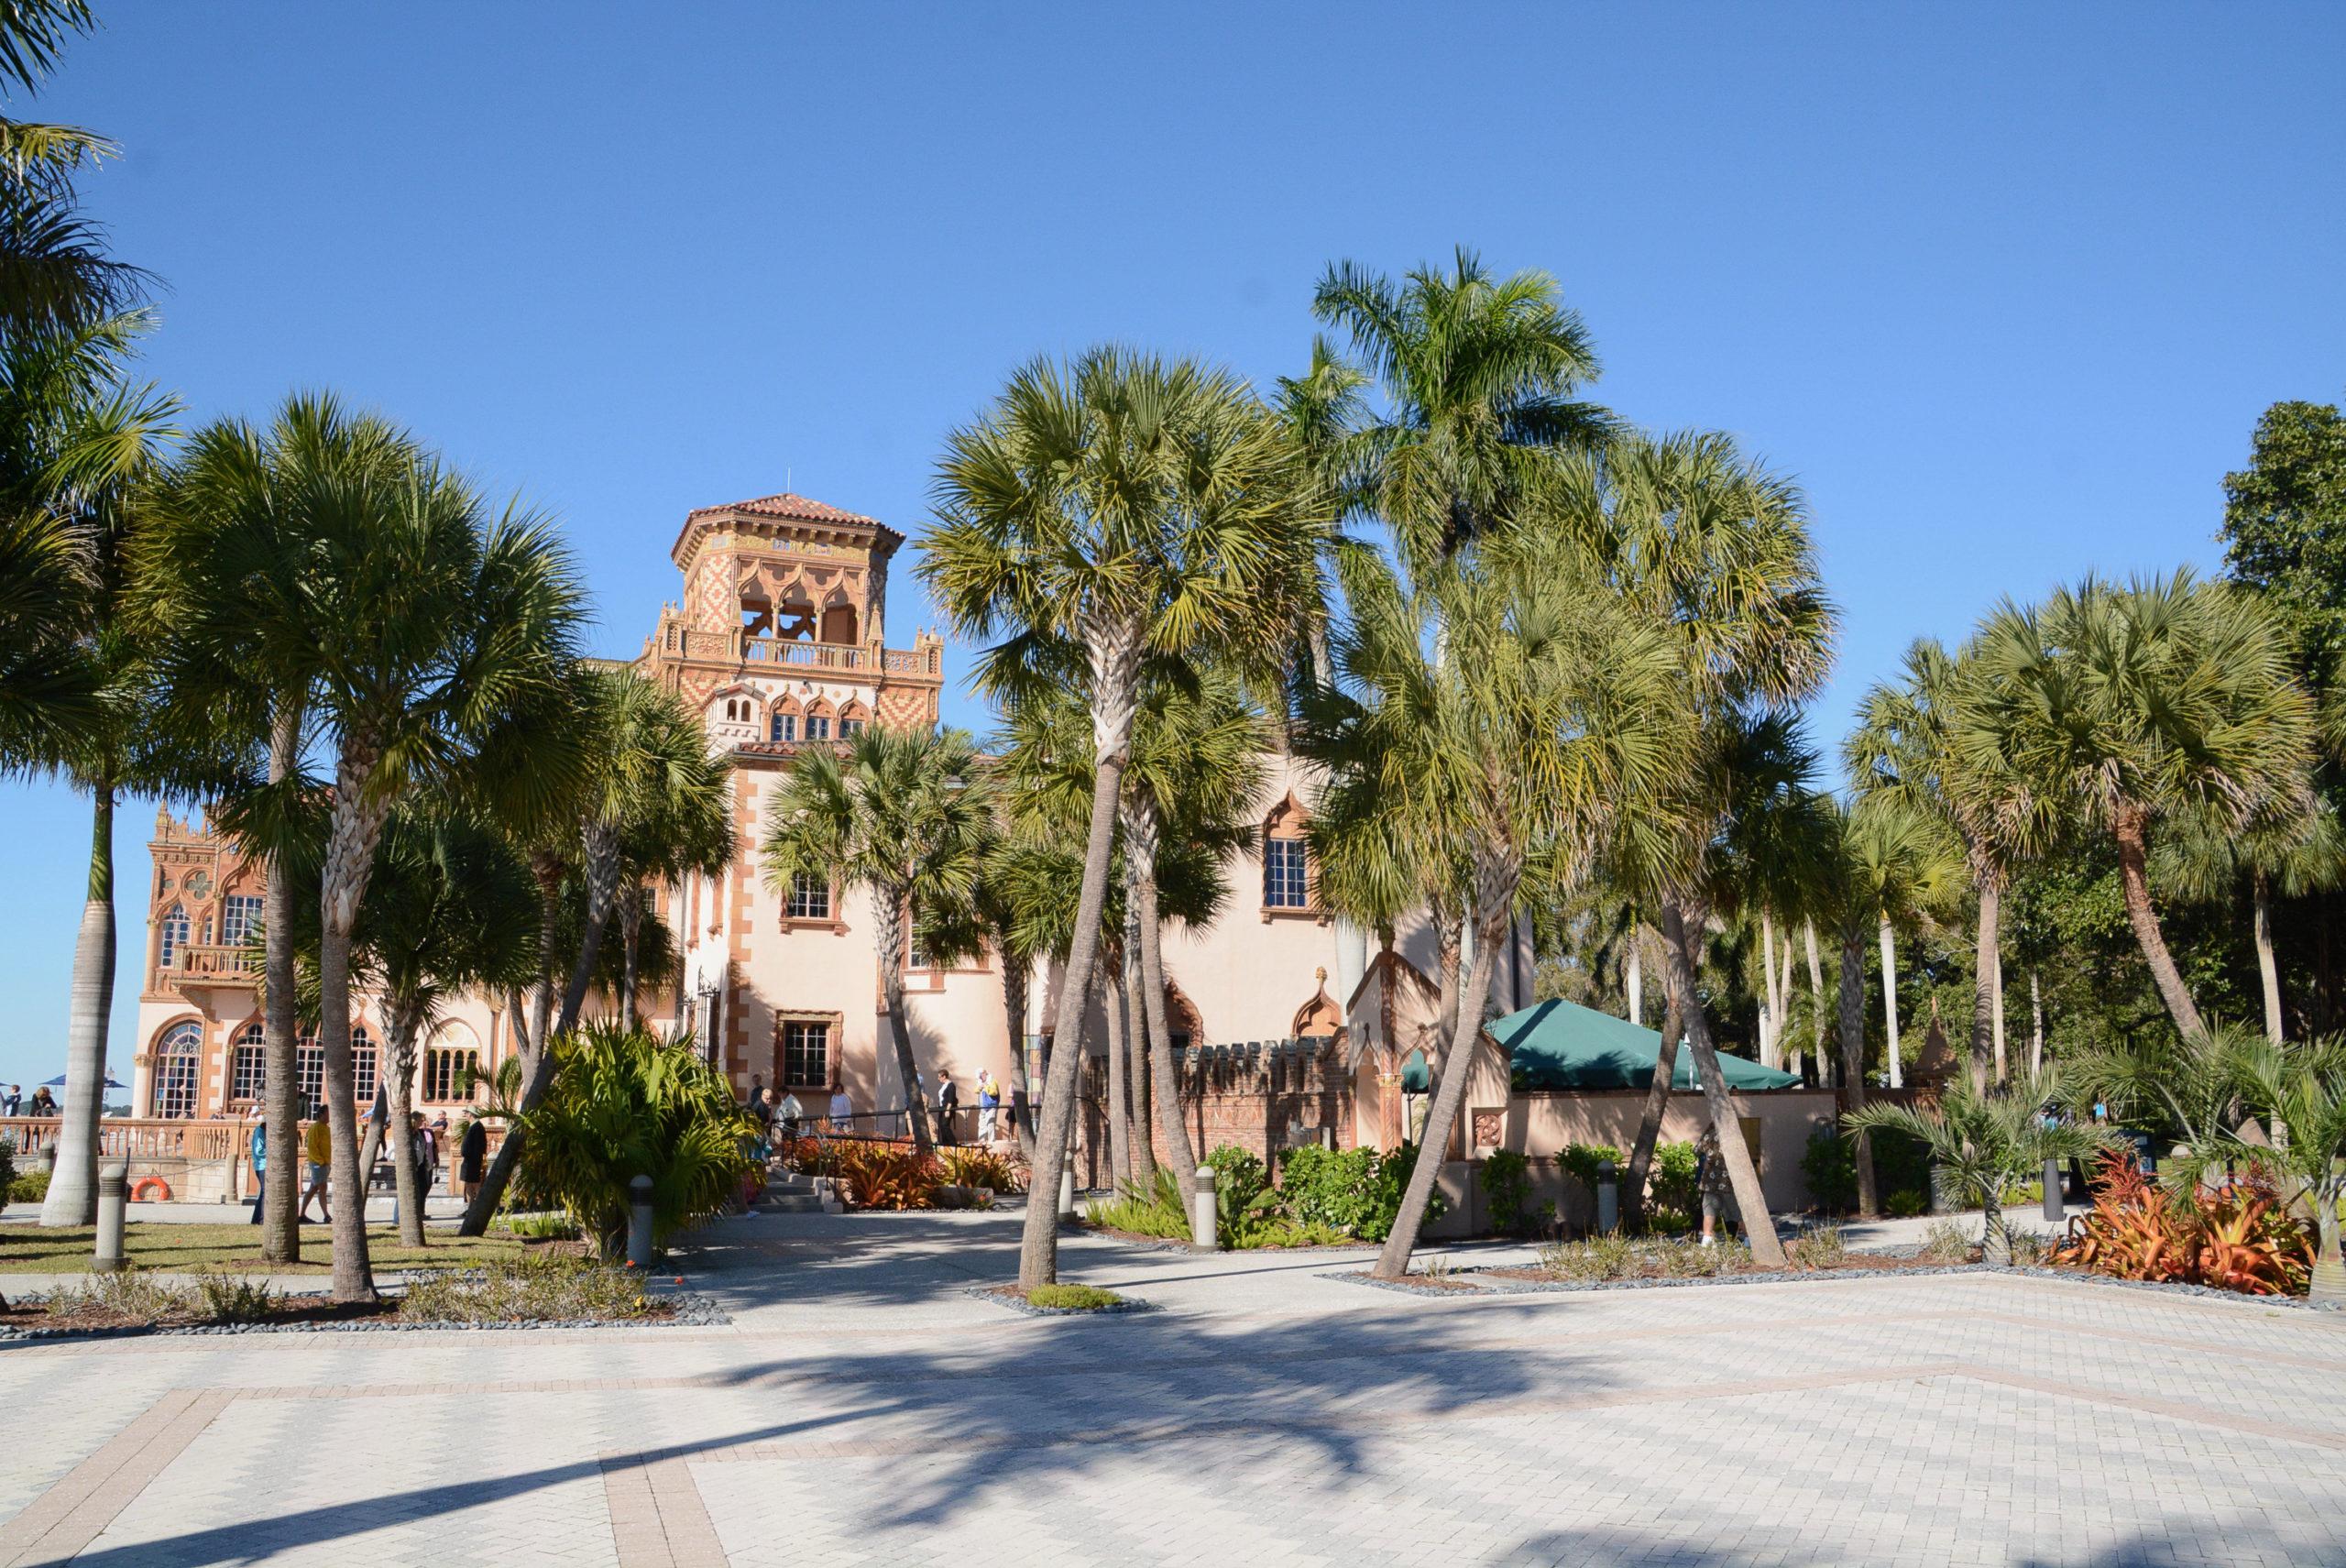 Die Märchenvilla Cà d'Zan gehört zu The Ringling in Sarasota mit dekorativen Königspalmen